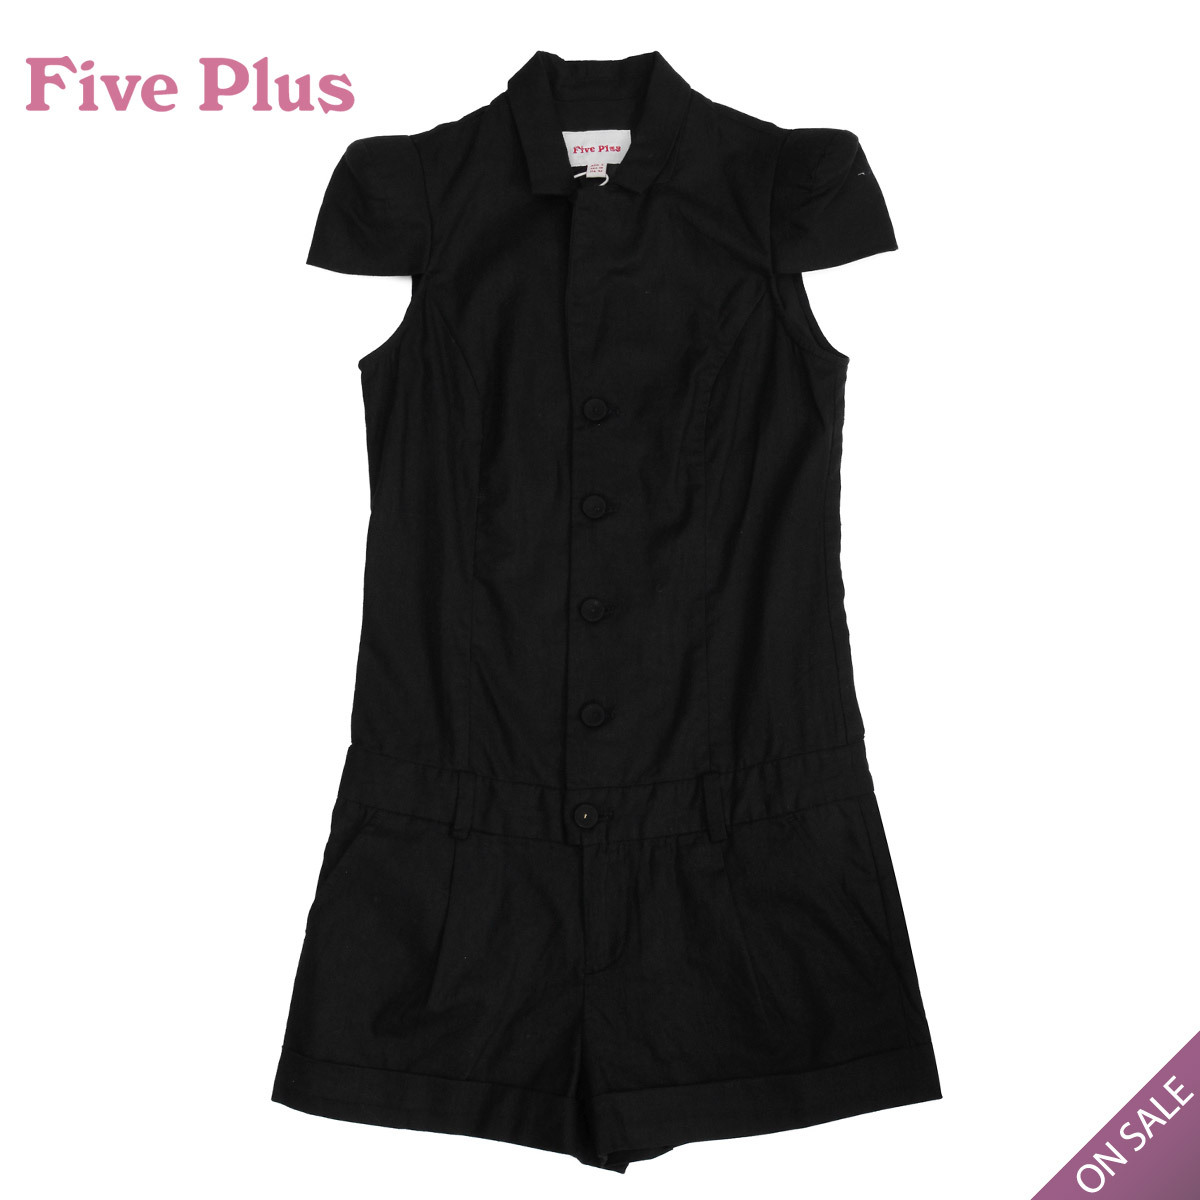 Женские брюки Five Plus 2102062020090 FivePlus 2102062020 Шорты, мини-шорты Костюм